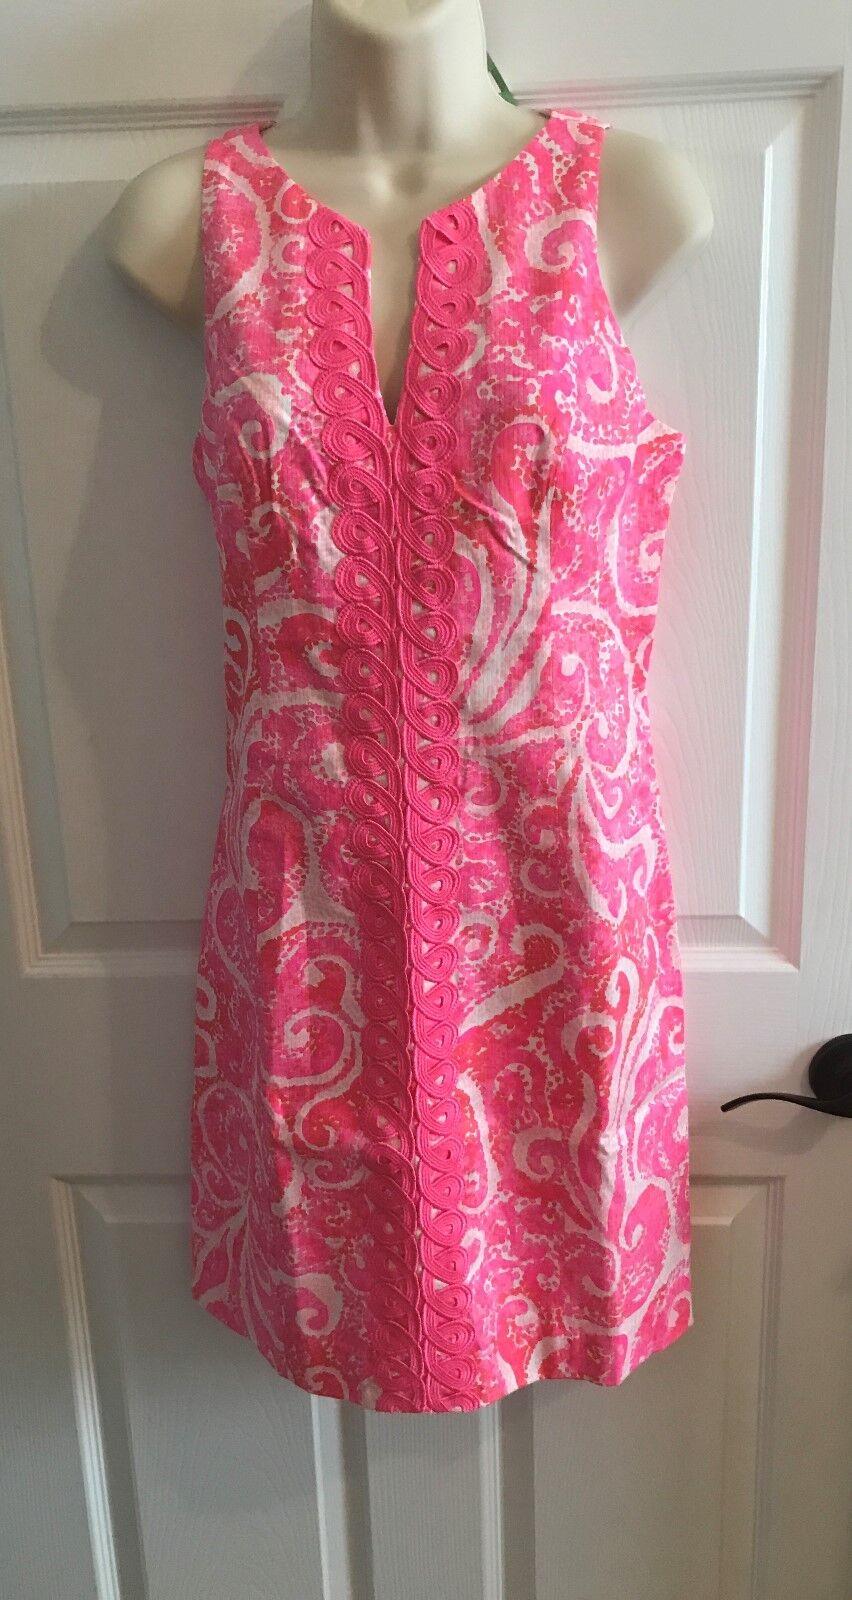 NWT LILLY PULITZER RYDER DRESS Rosa Pout PBJ  Größe 2 or Größe 8 Or Größe 12